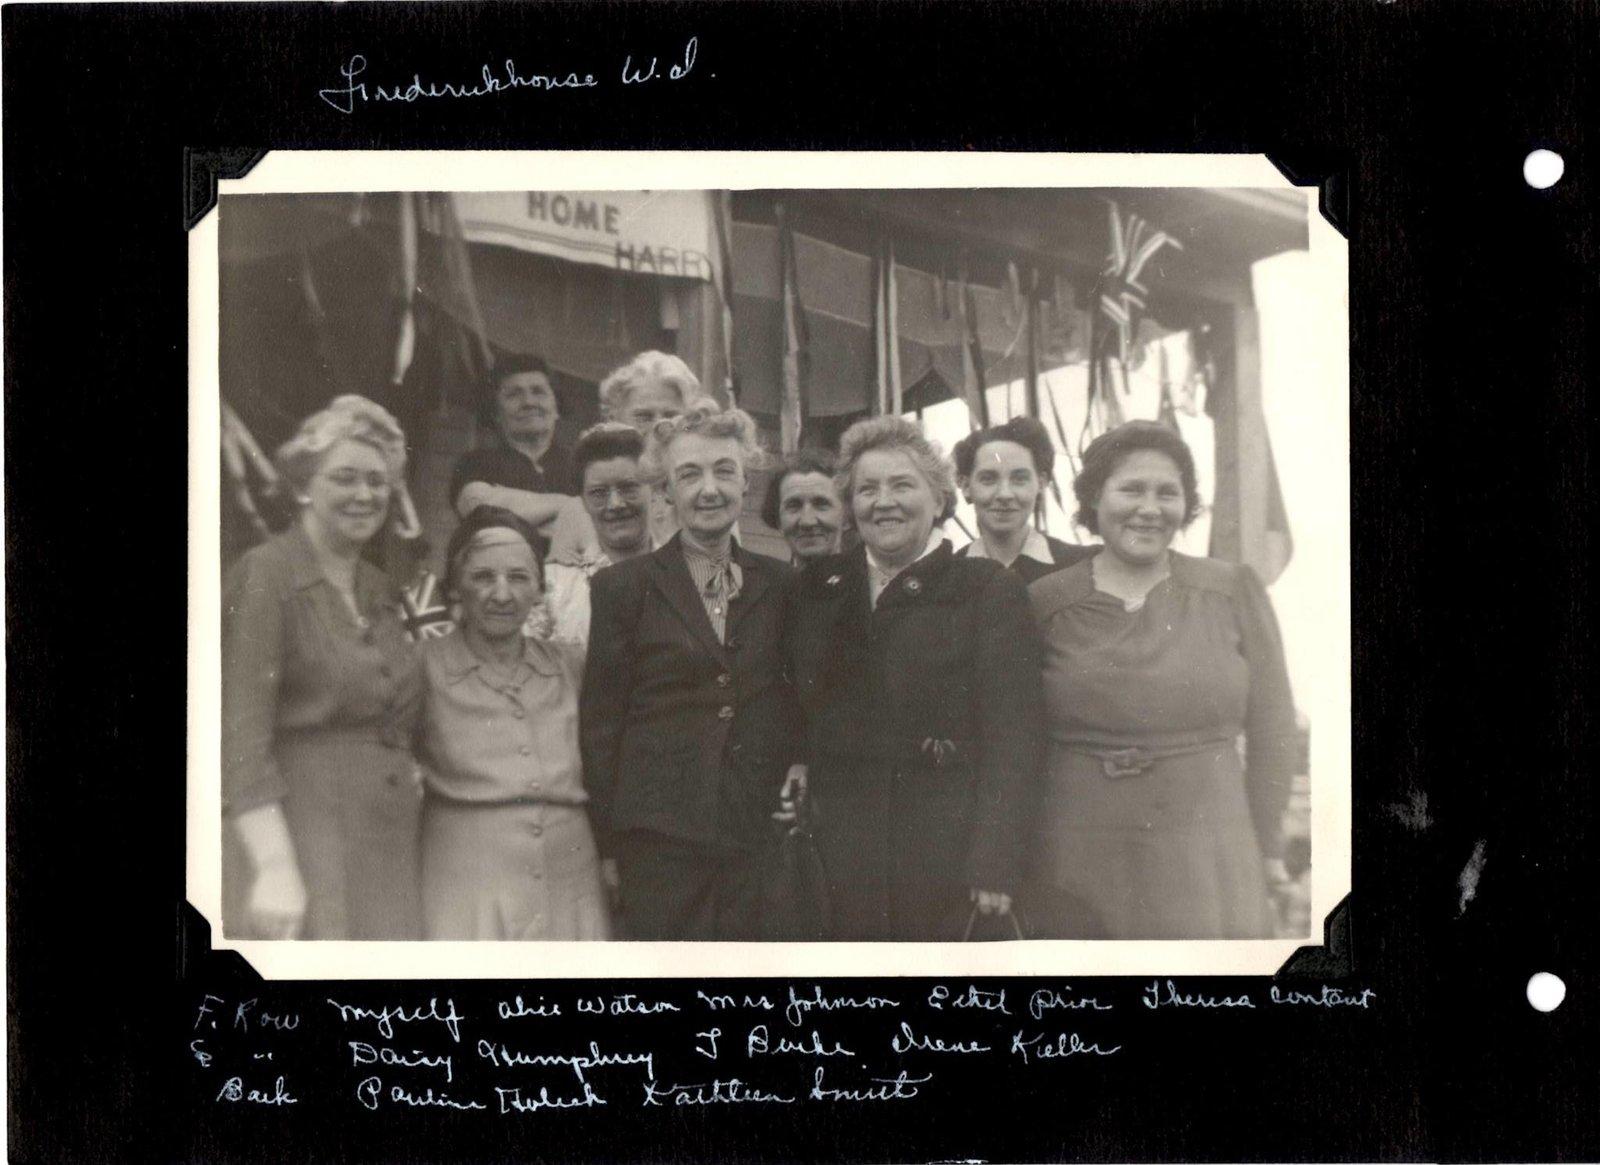 Frederickhouse WI Group Photo, 1940s